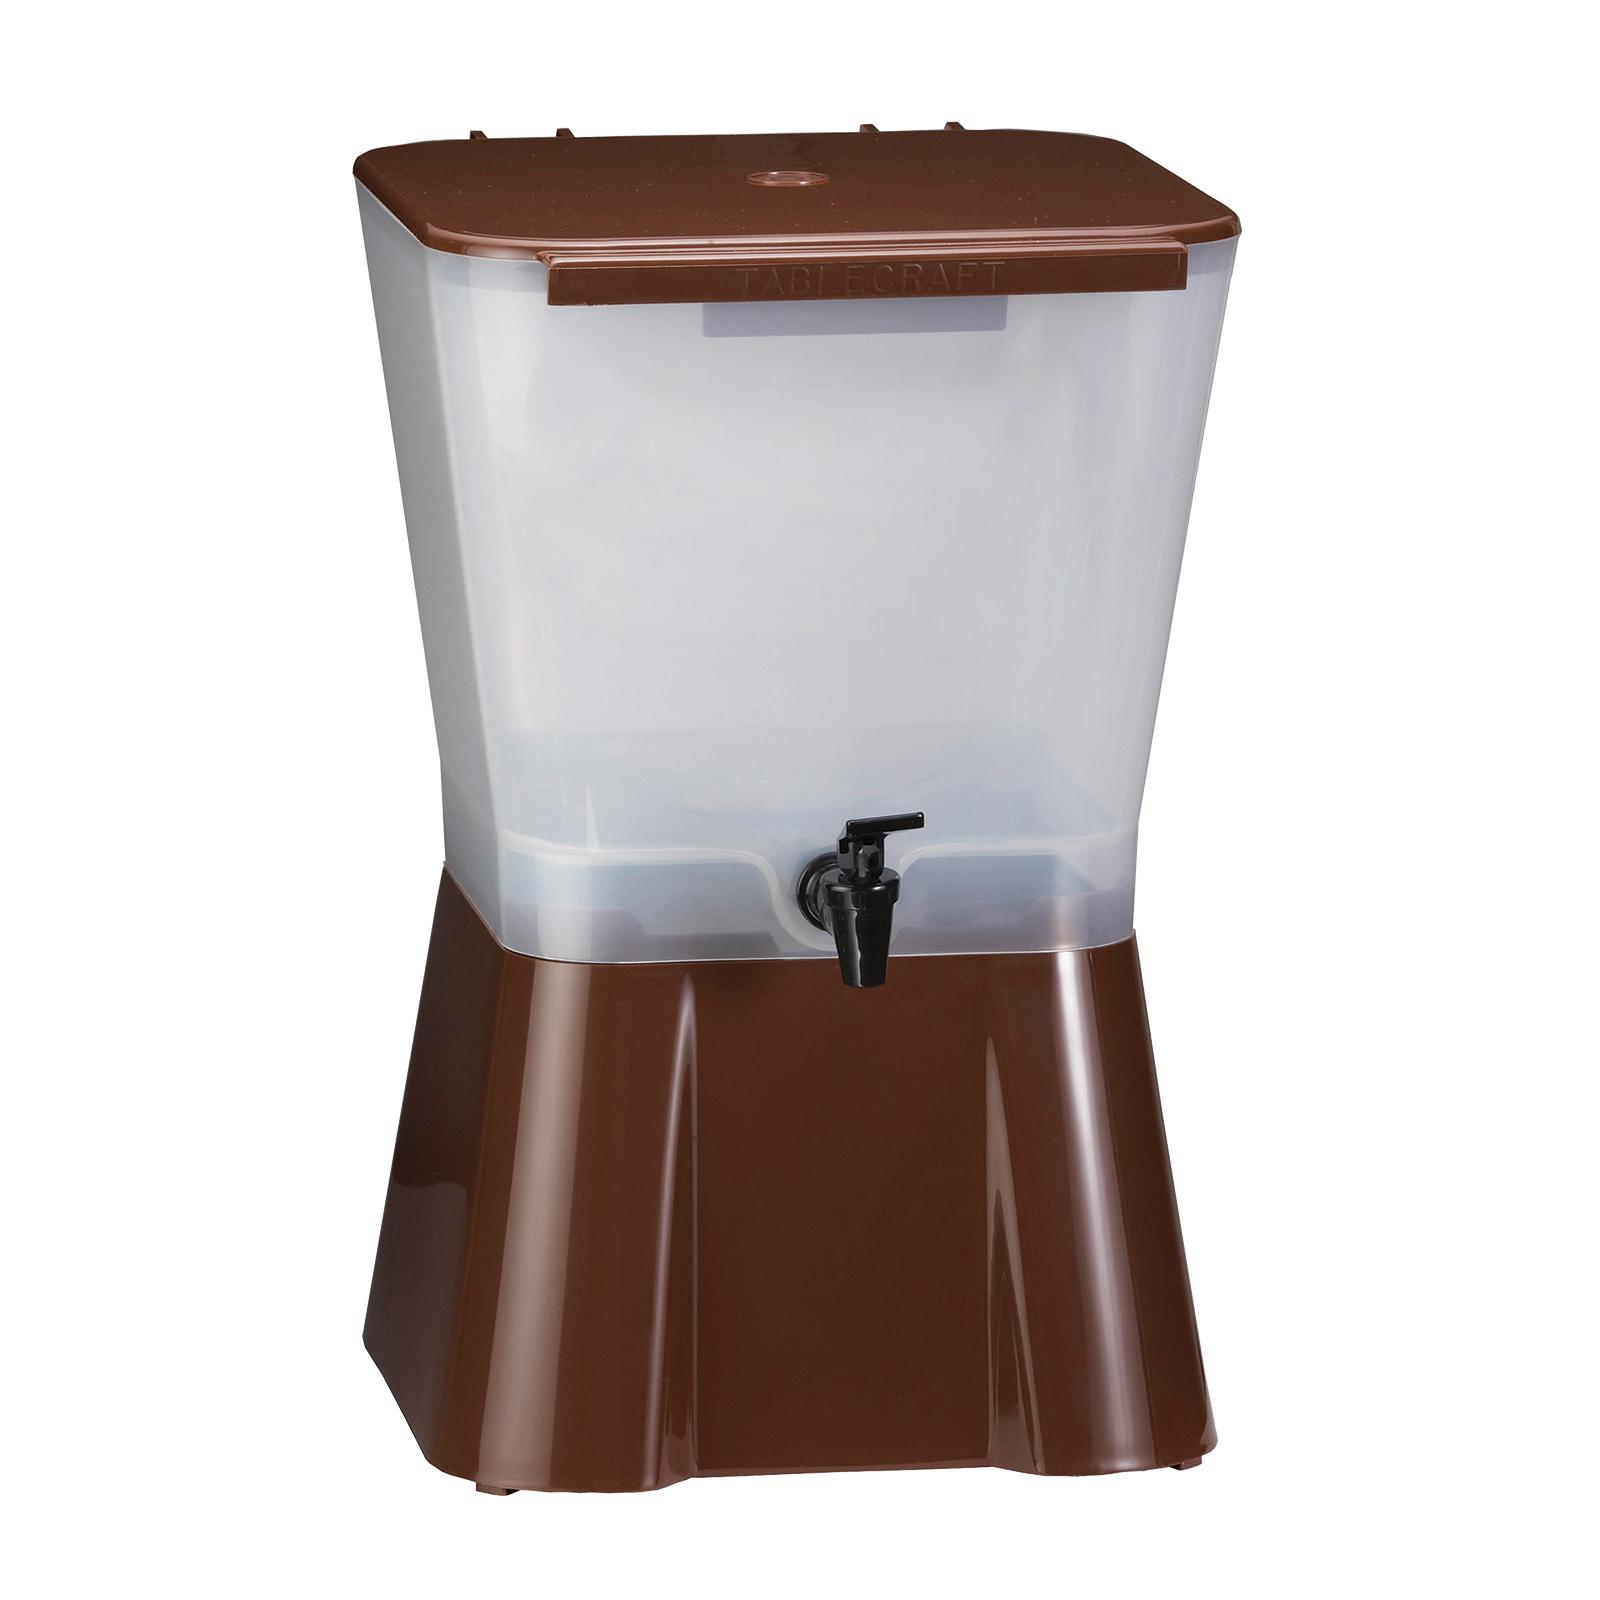 TableCraft Products 954B beverage dispenser, stand